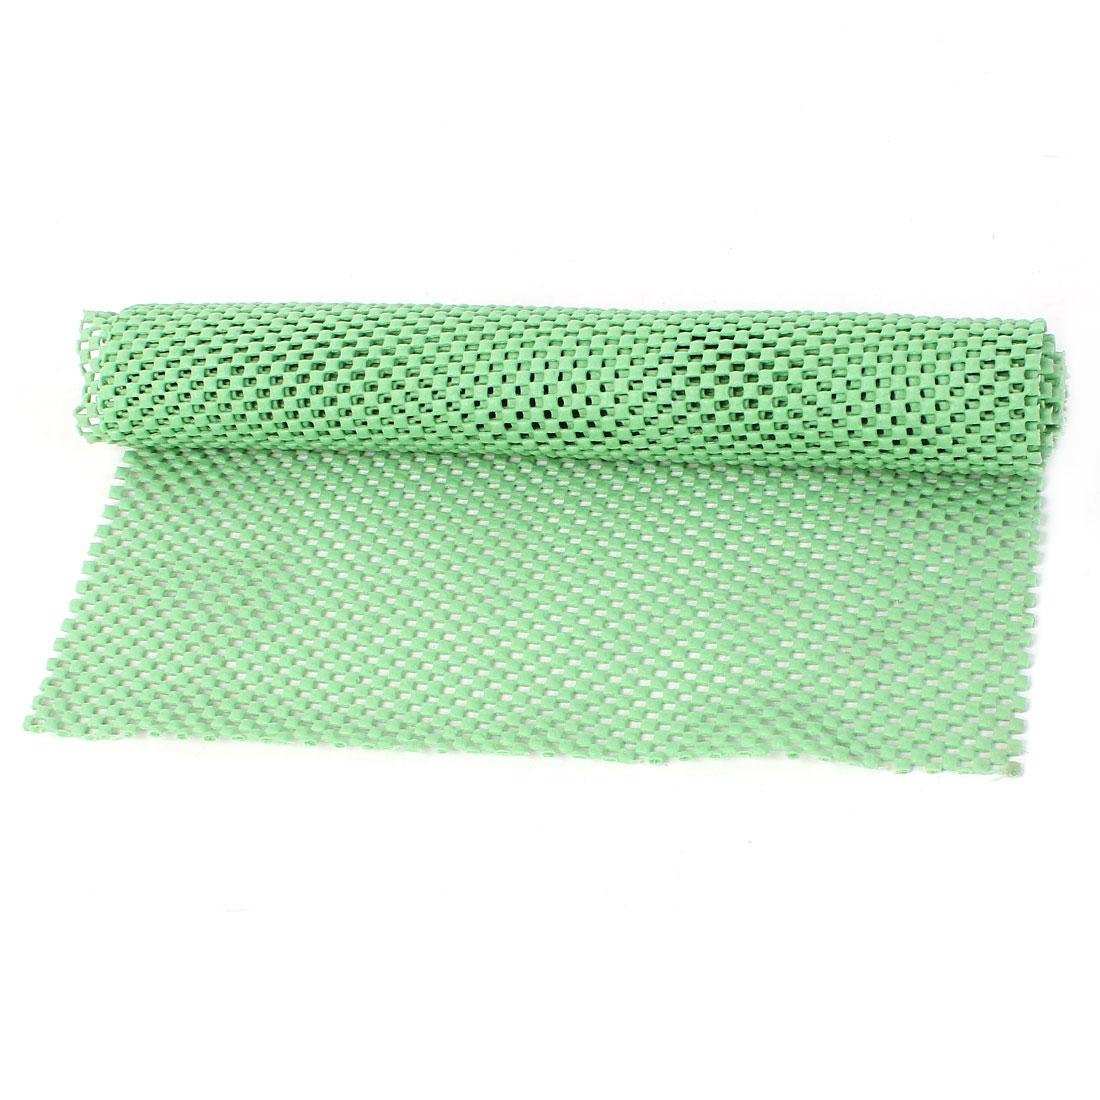 Car Vehicle Auto Soft Foam Pad Toolbox Drawer Liner Antislip Mat Green 90cm x 30cm